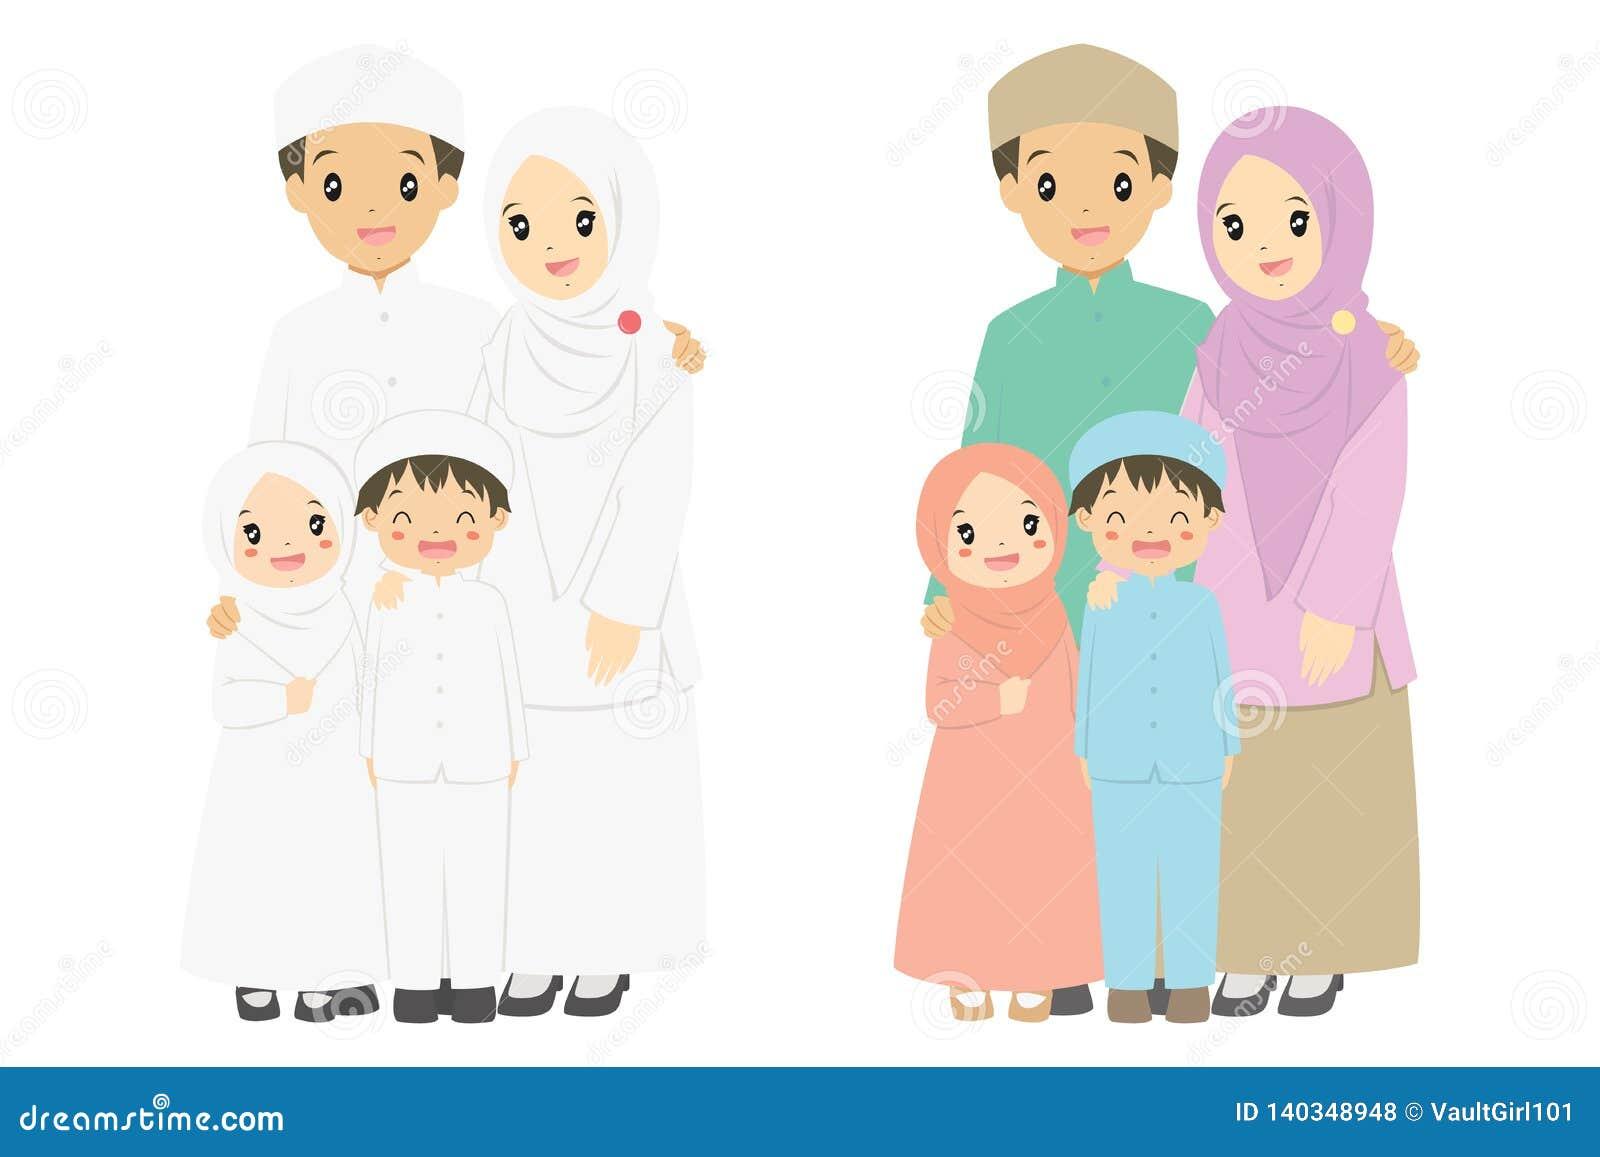 Happy Muslim Family Portrait Vector Stock Vector Illustration Of Bond Children 140348948